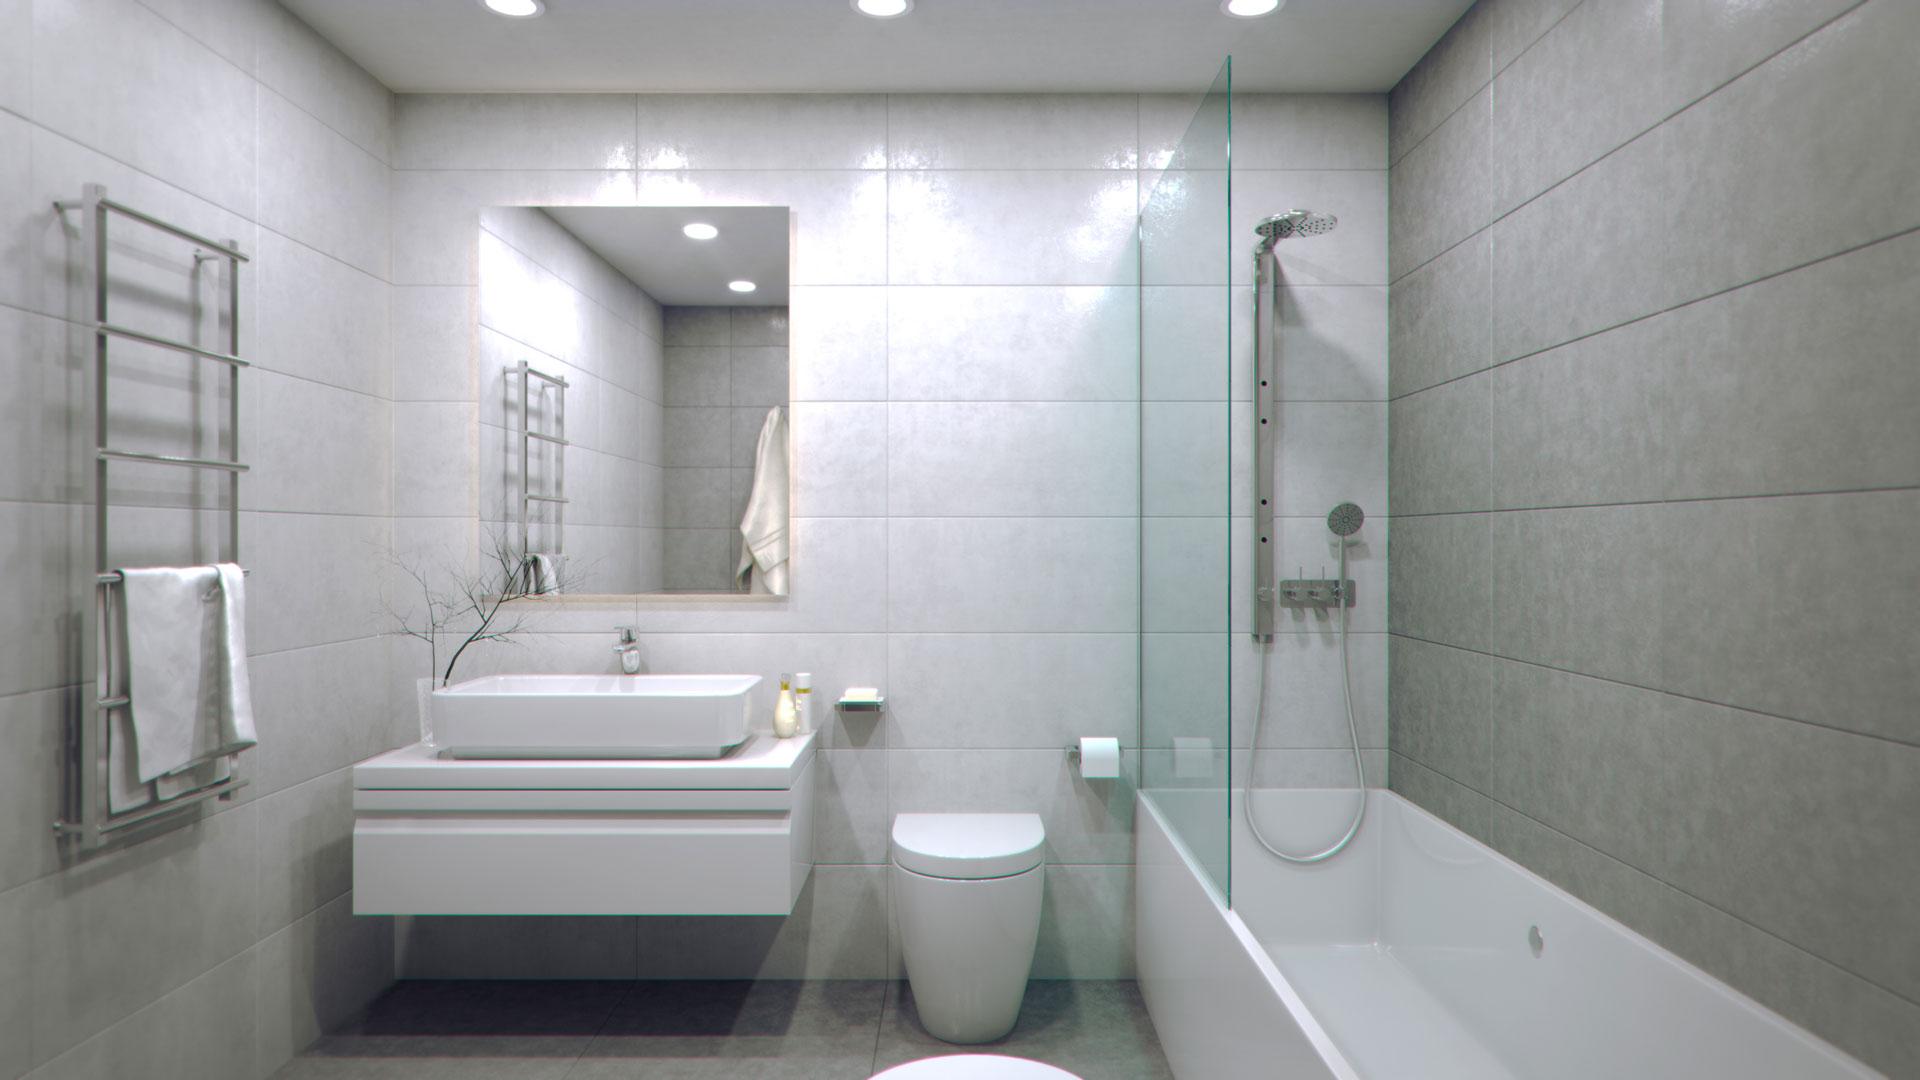 Estilo design residencial conil costa for Banos en tonos grises